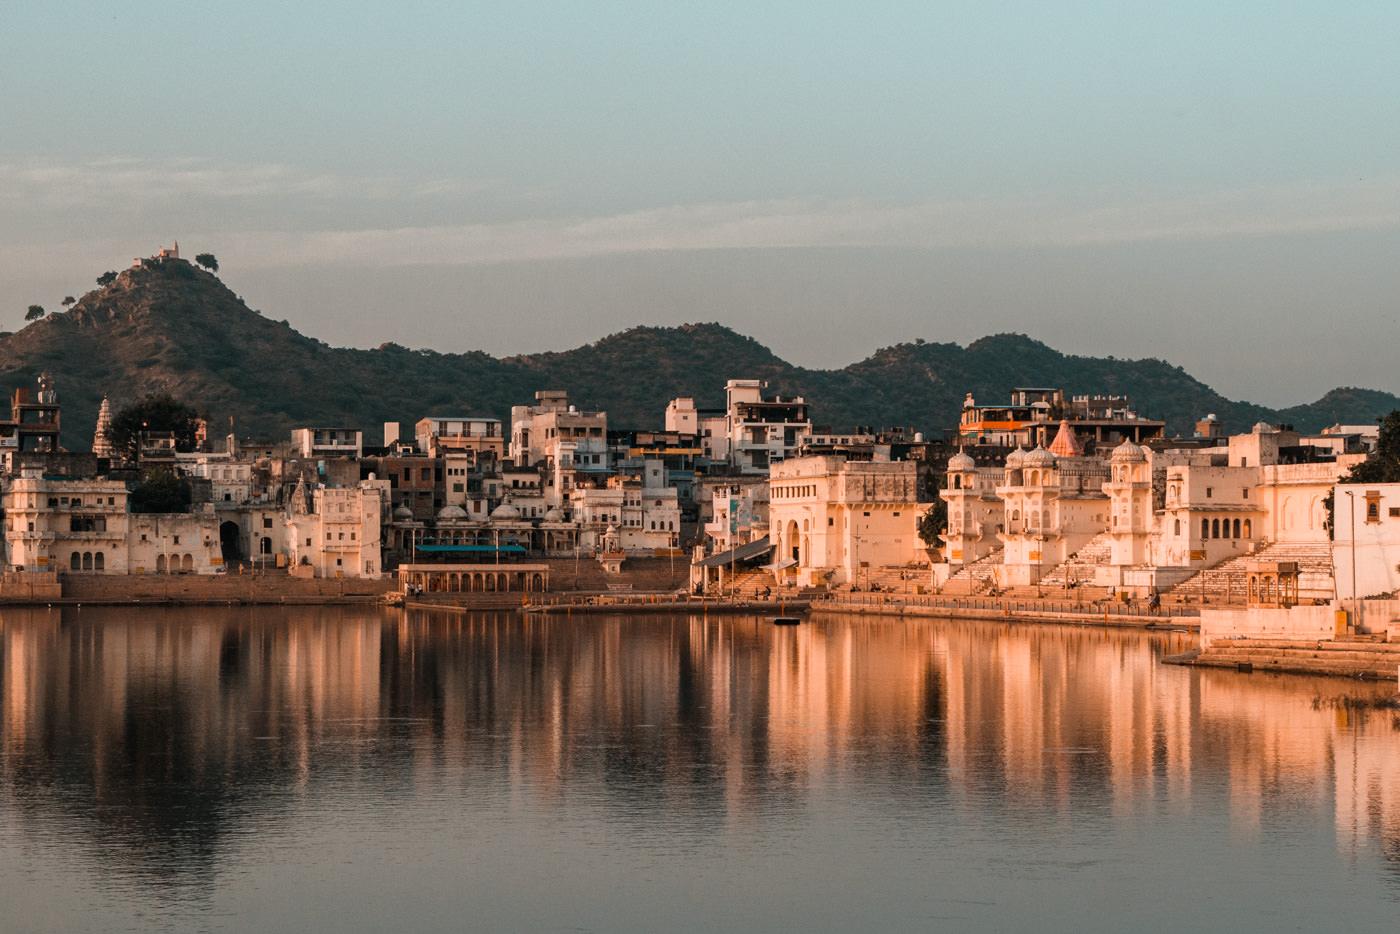 Sonnenuntergang am See von Pushkar